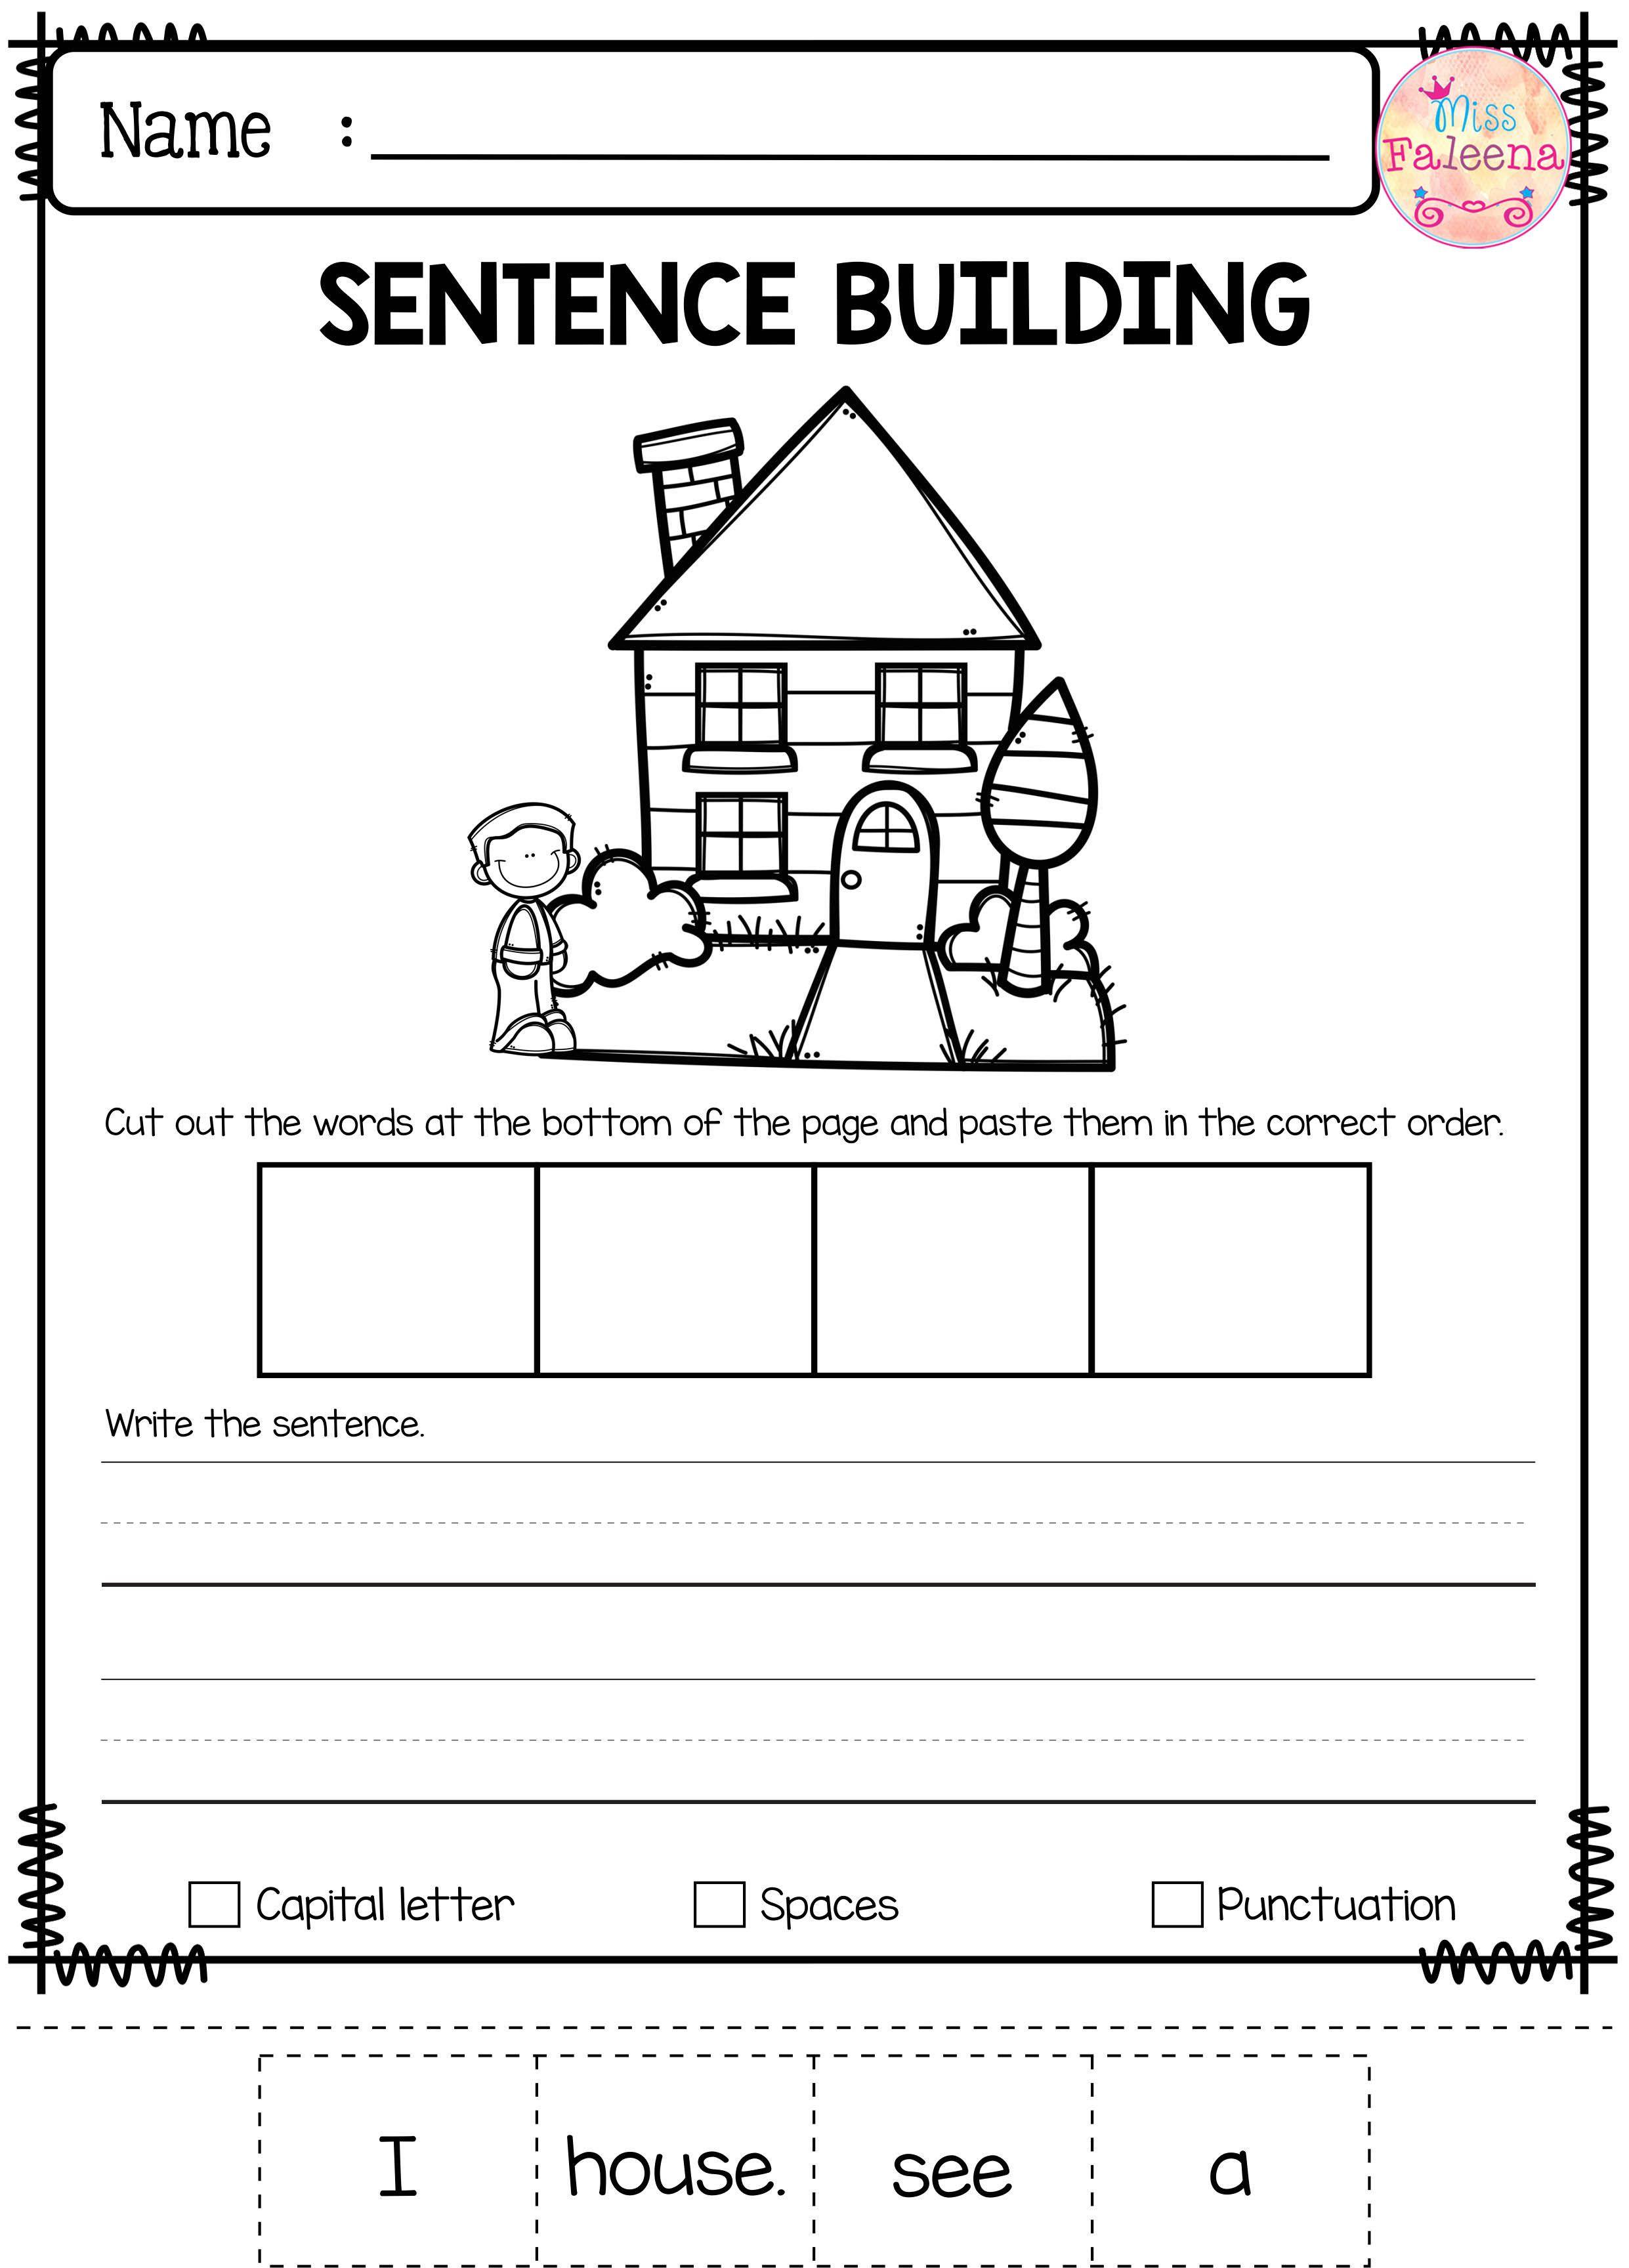 Free Sentence Building